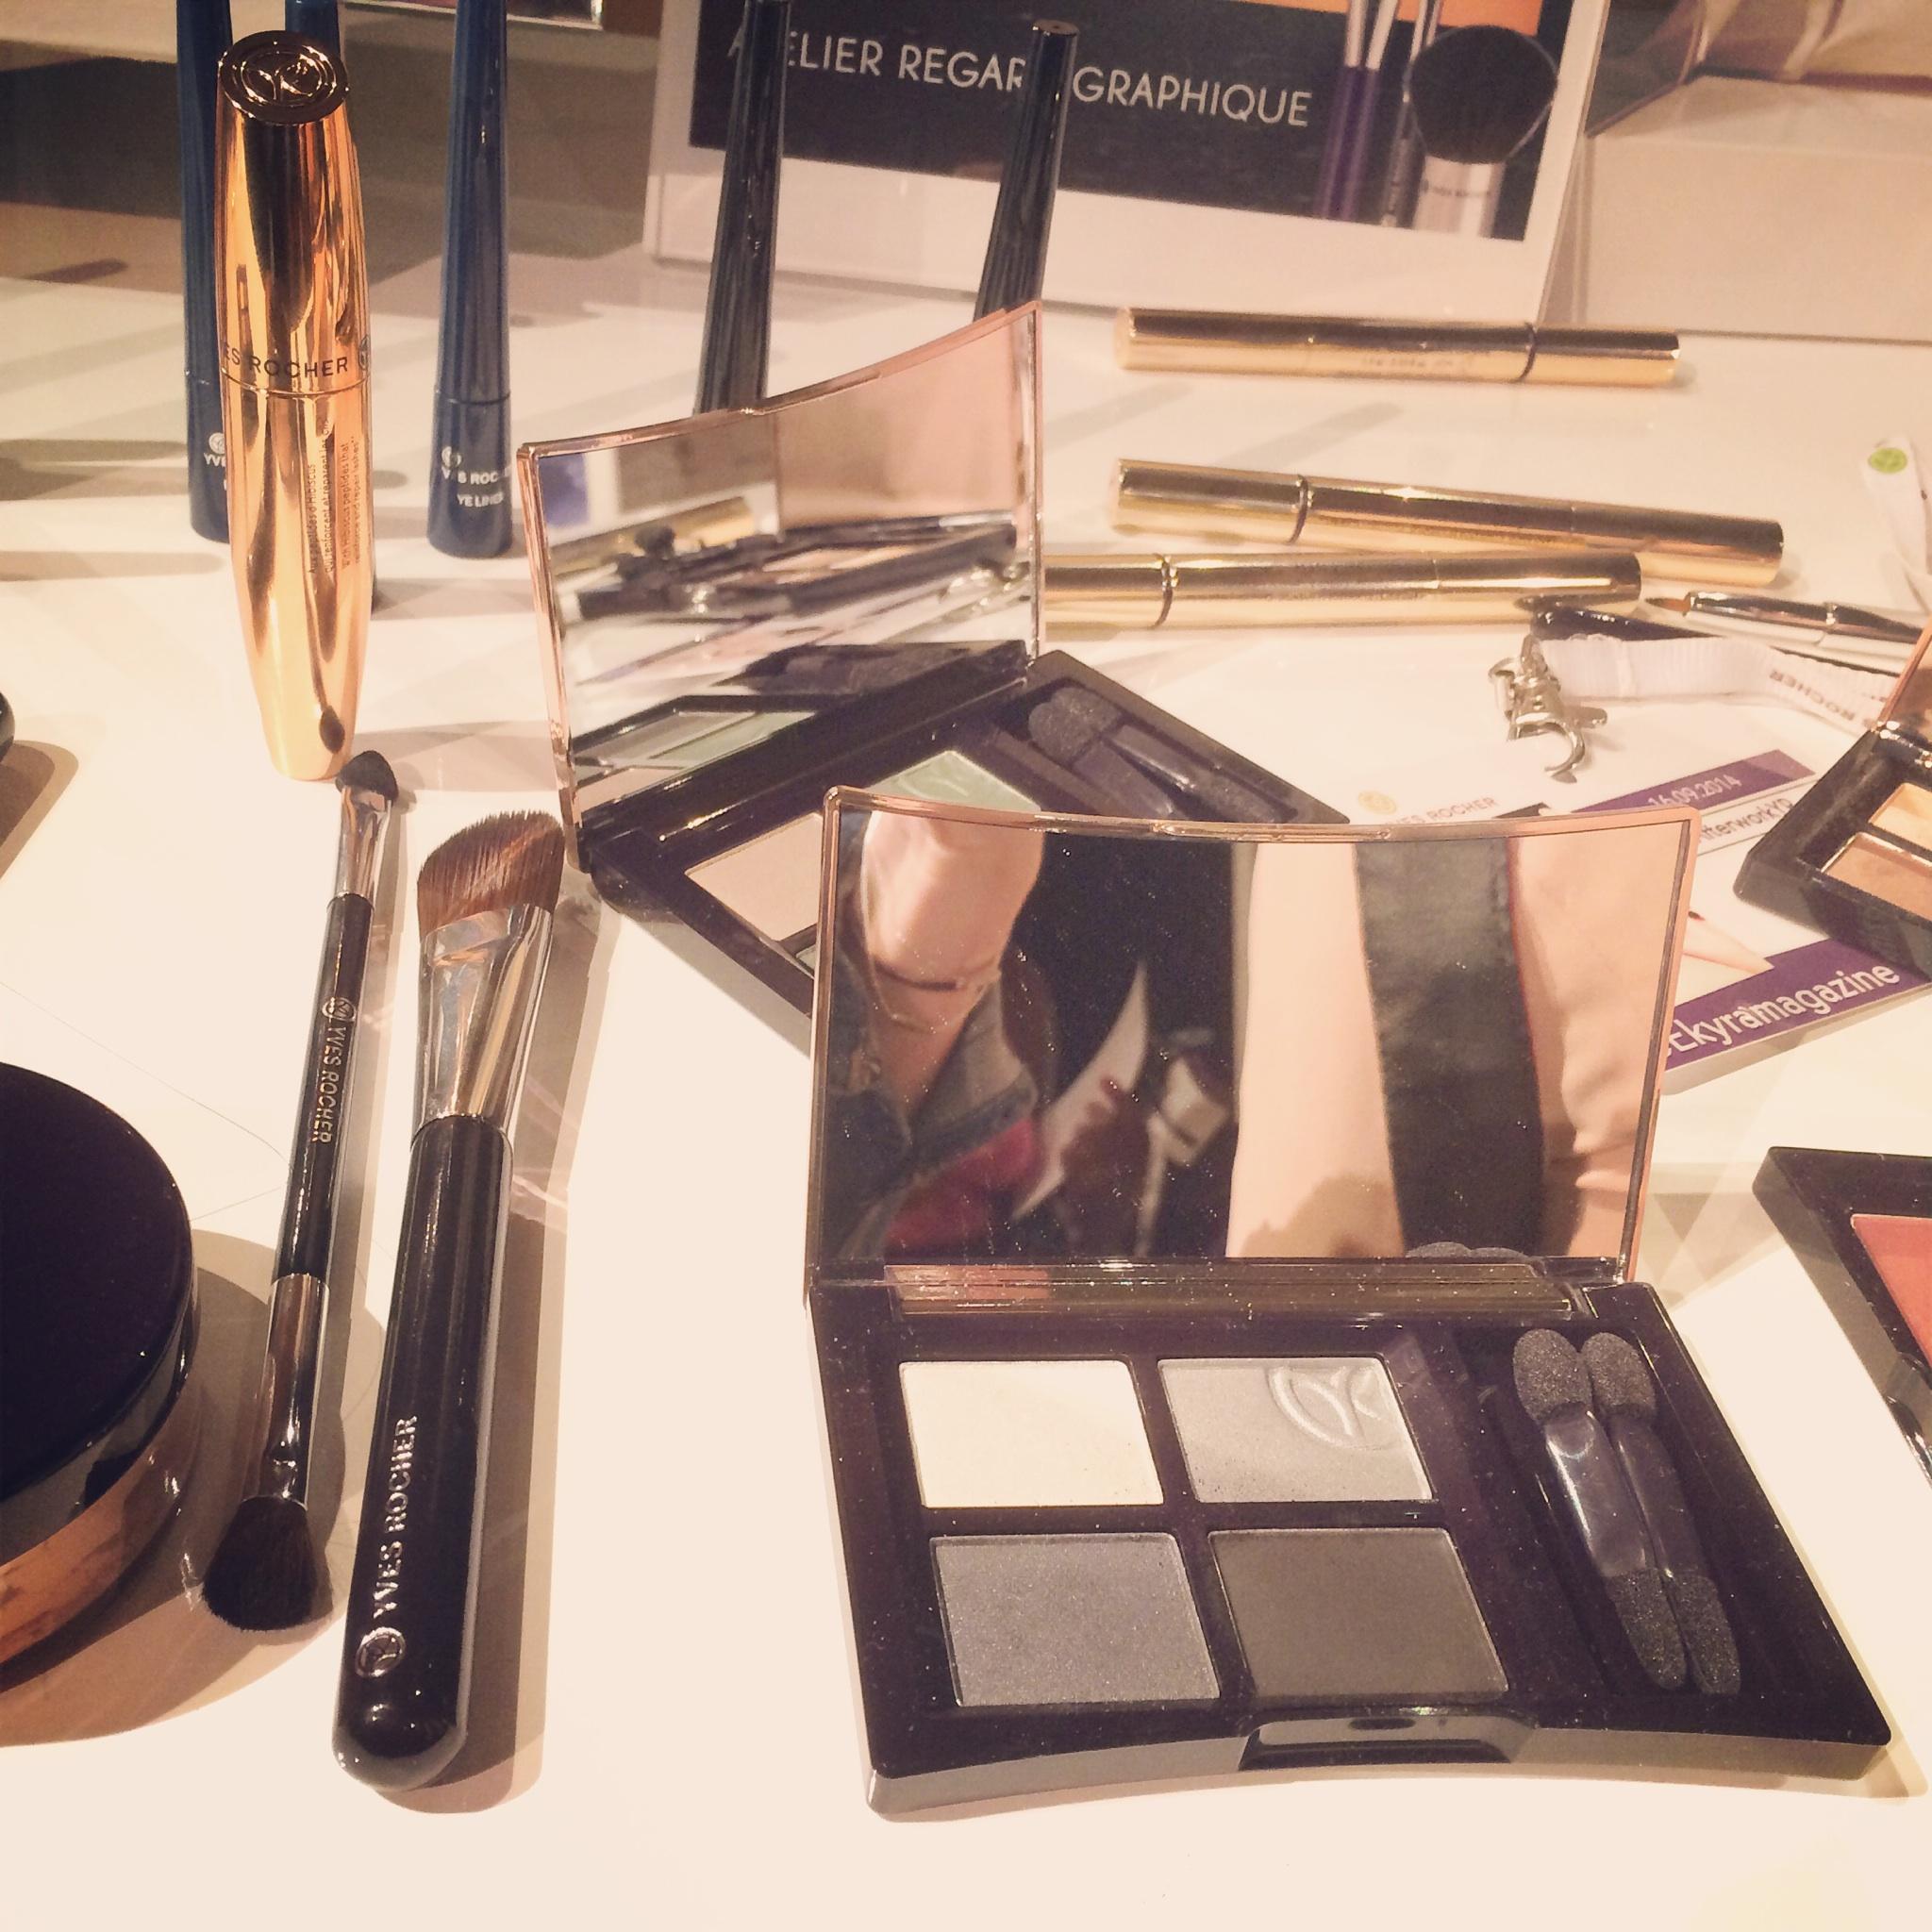 Les Papotages de Nana - Make up days Yves Rocher